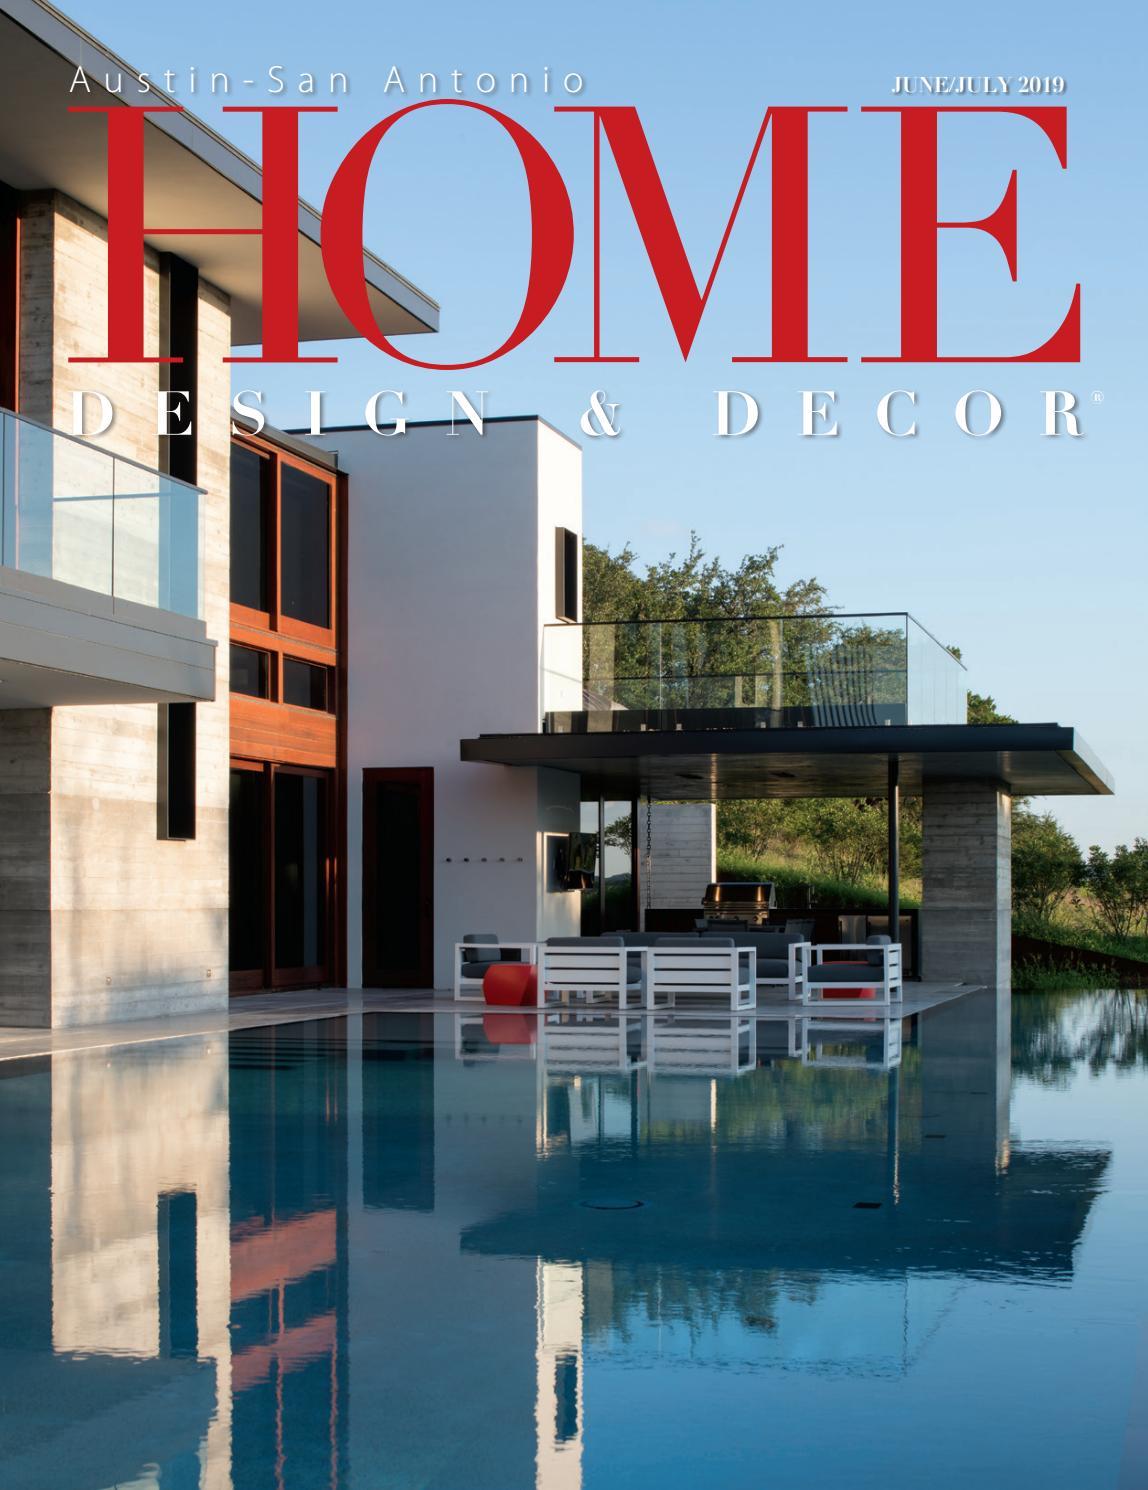 Home Design Decor Austin San Antonio June July 2019 By Trisha Doucette Issuu